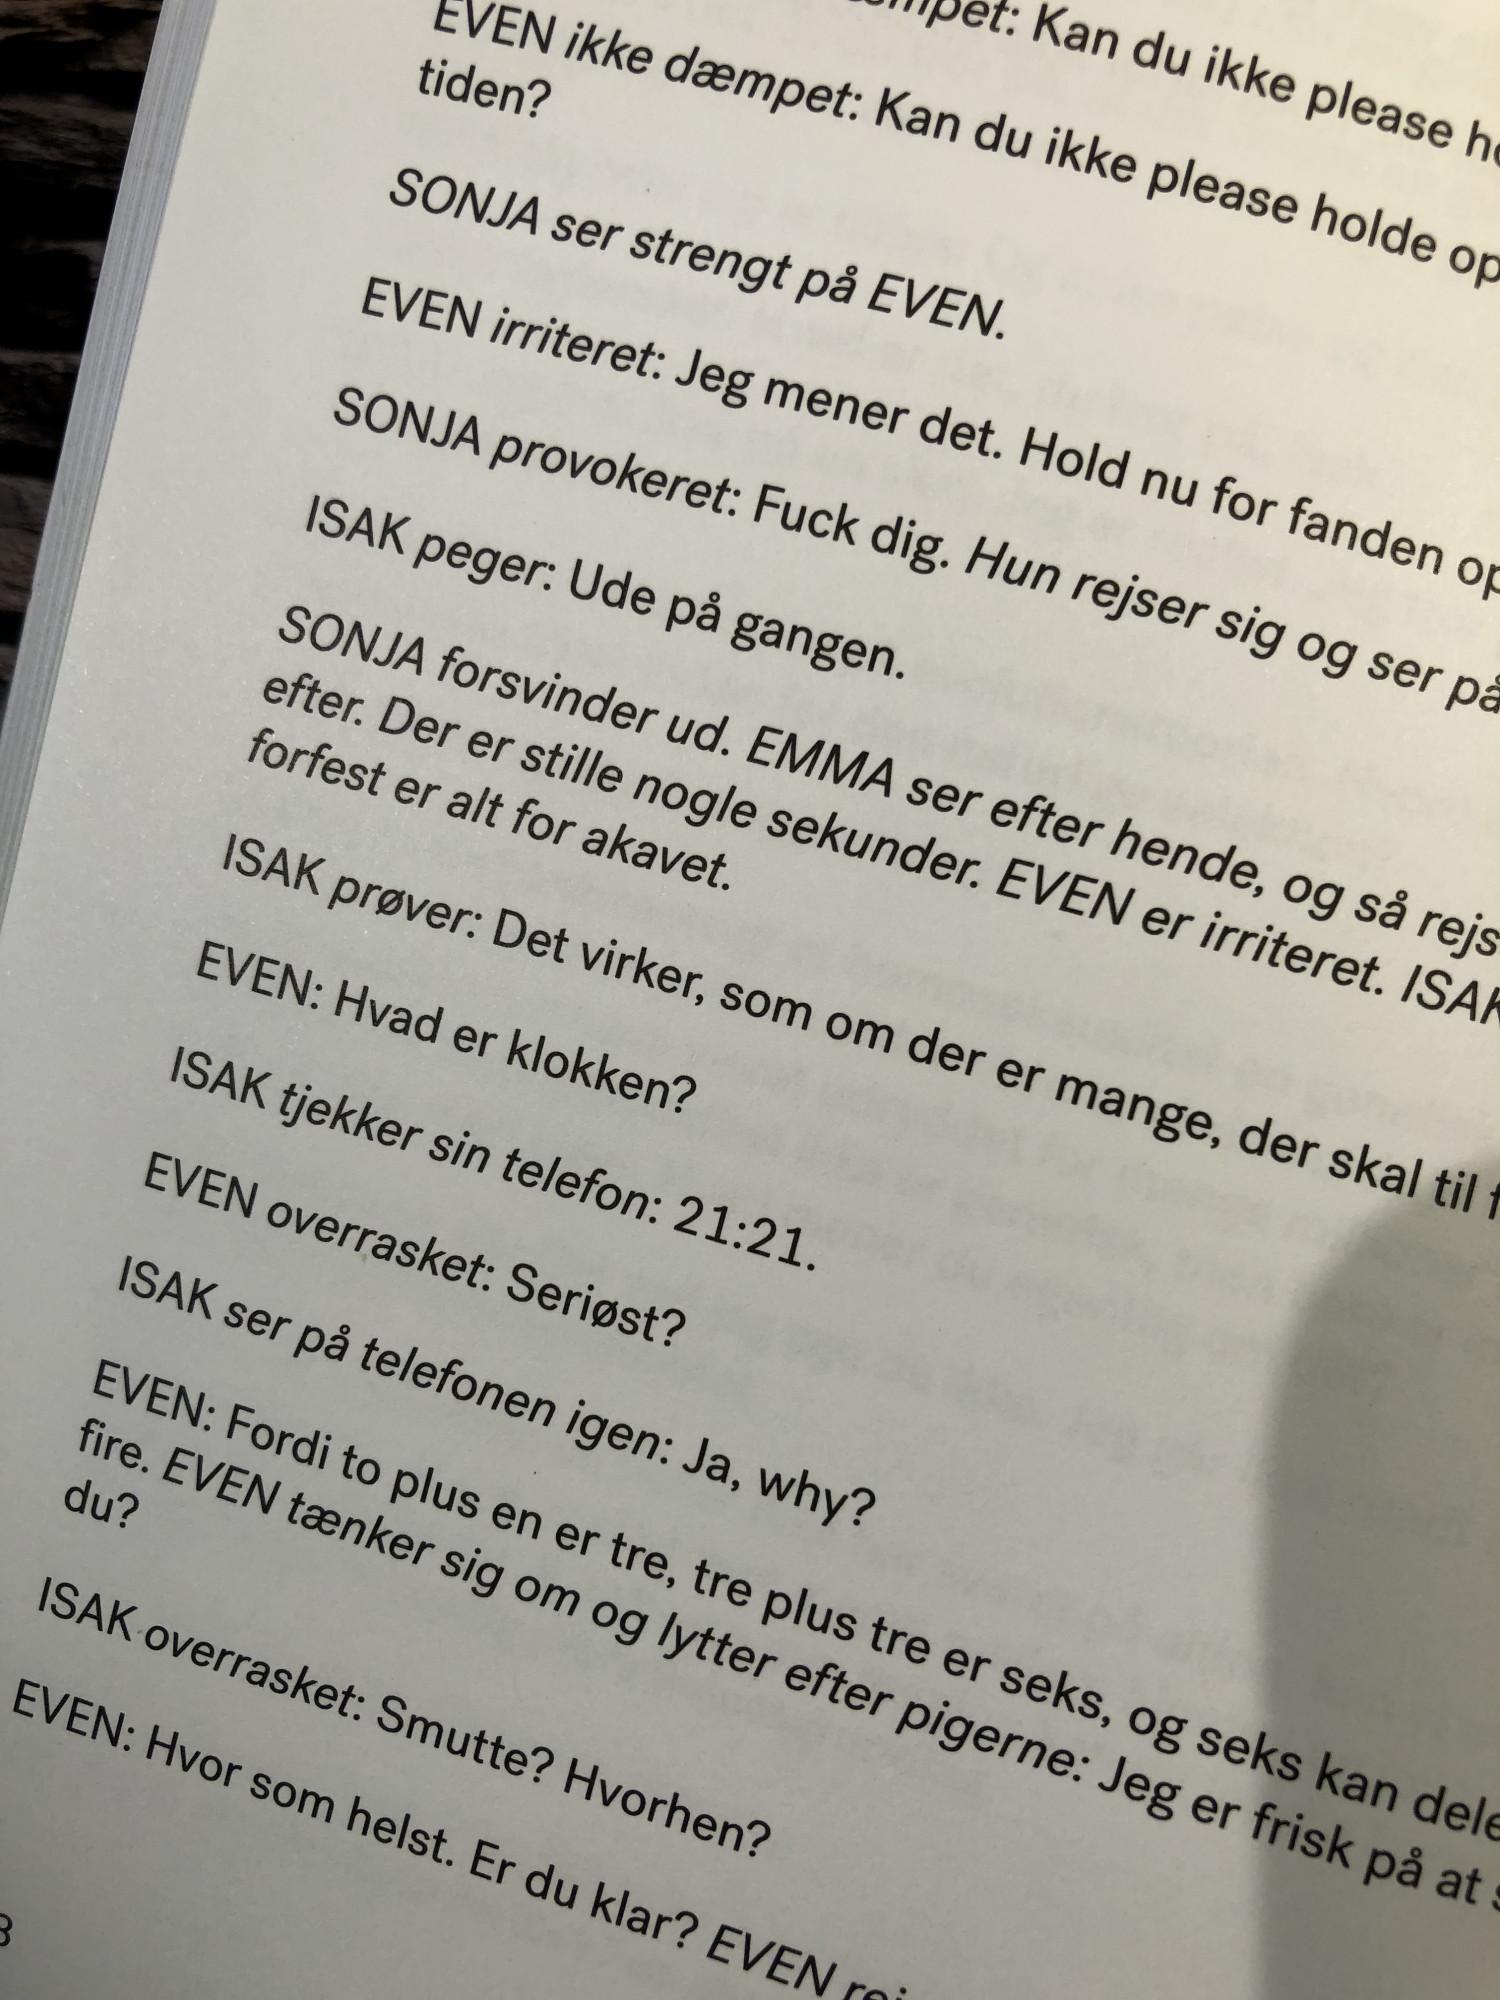 SKAM, Skam sæson 3, Skam Isak sin sesong, SKAM Isak, Isak & Even, Krummeskrummelurer, Krummeskrummelurer.dk, Krummes Krummelurer, Boganmeldelse, Anmeldelse, Anmeldereksemplar, Krumme anbefaler, Julie Andem, Høst & Søn, Rosinante & Co., NRK, SKAM bog, SKAM bok,